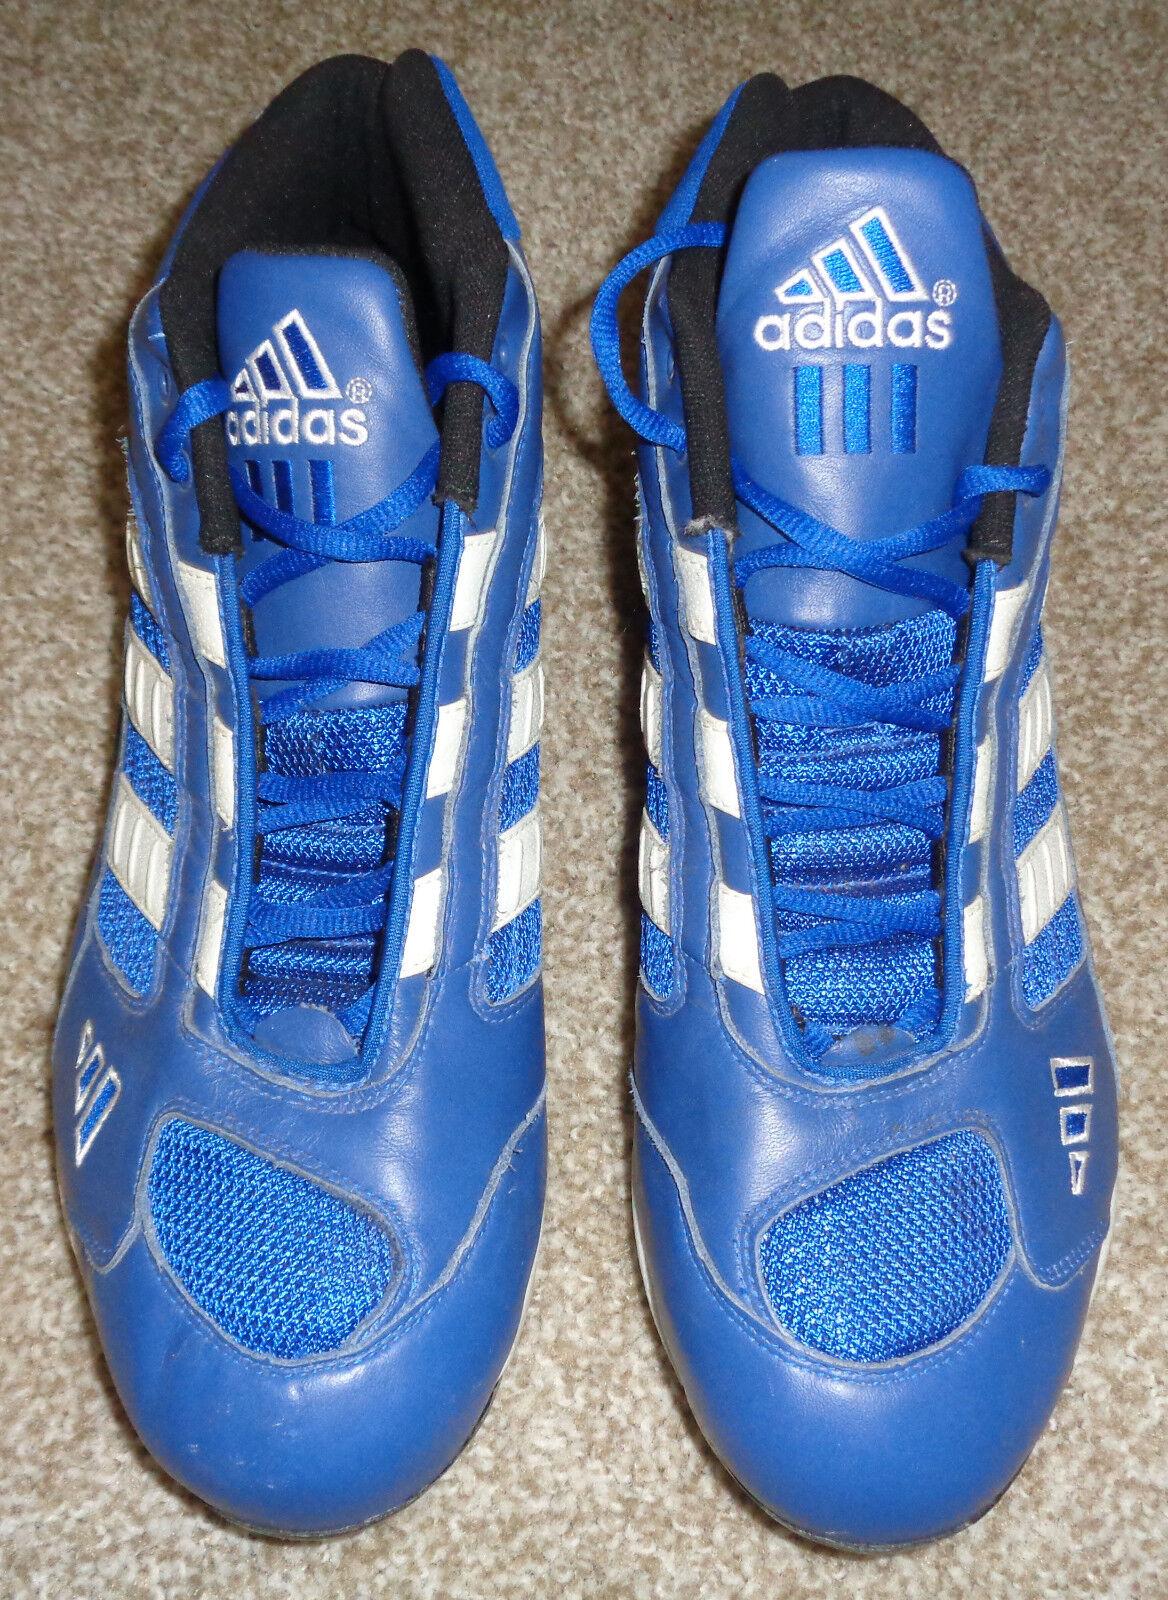 Adidas High-Top Baseball Cleats Size 14 US 13-1 2  2 FR JP 320